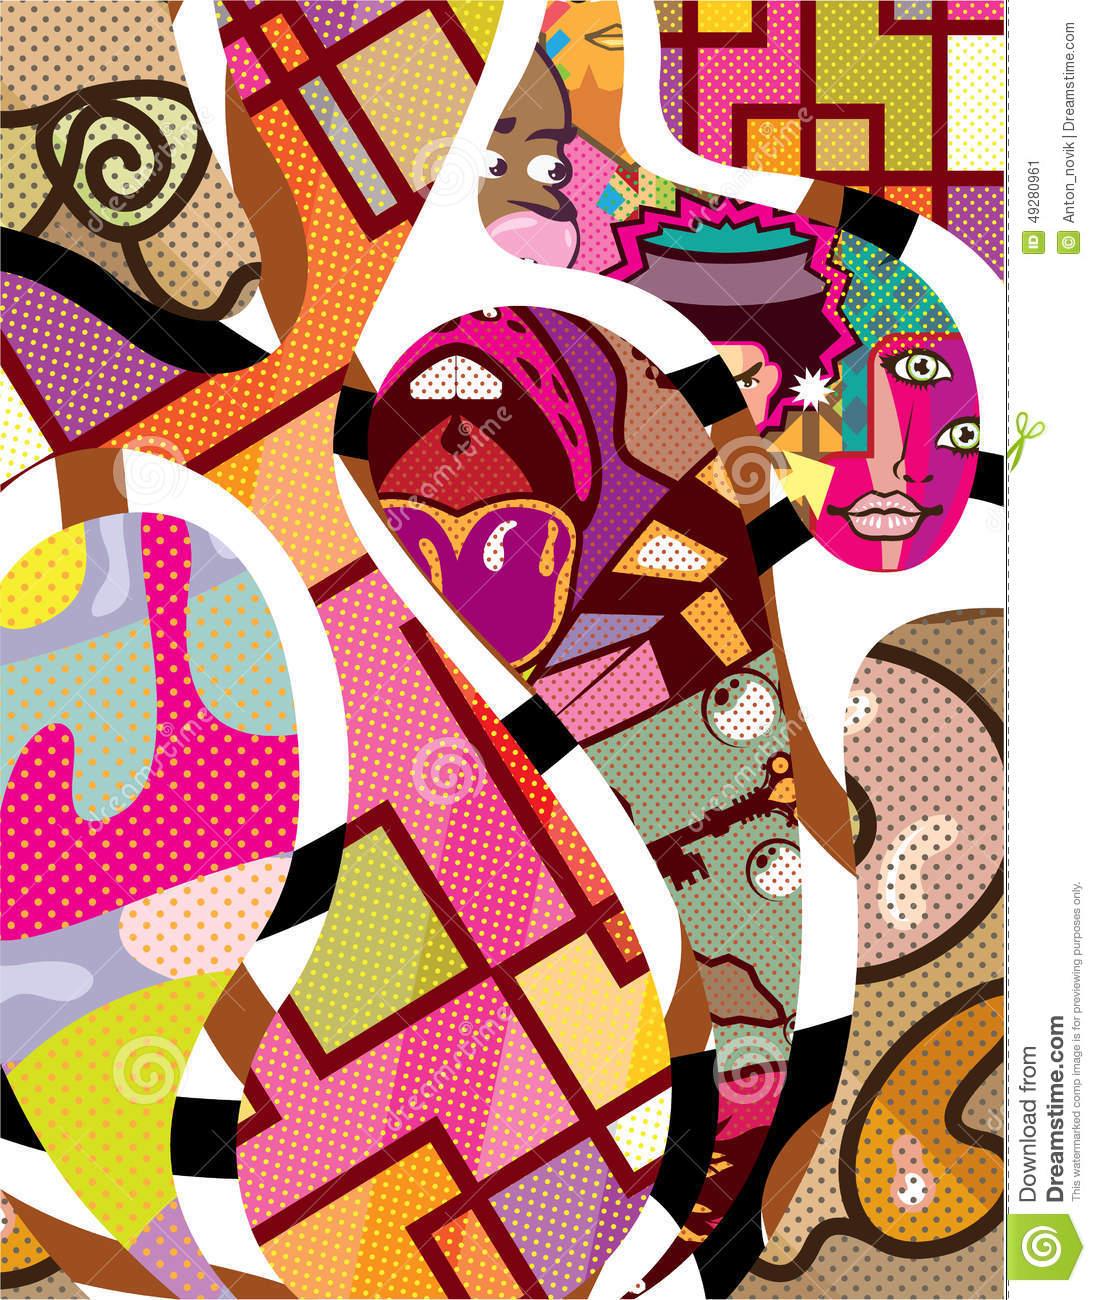 CutOut Abstract Vector Art Compilation Stock Vector.